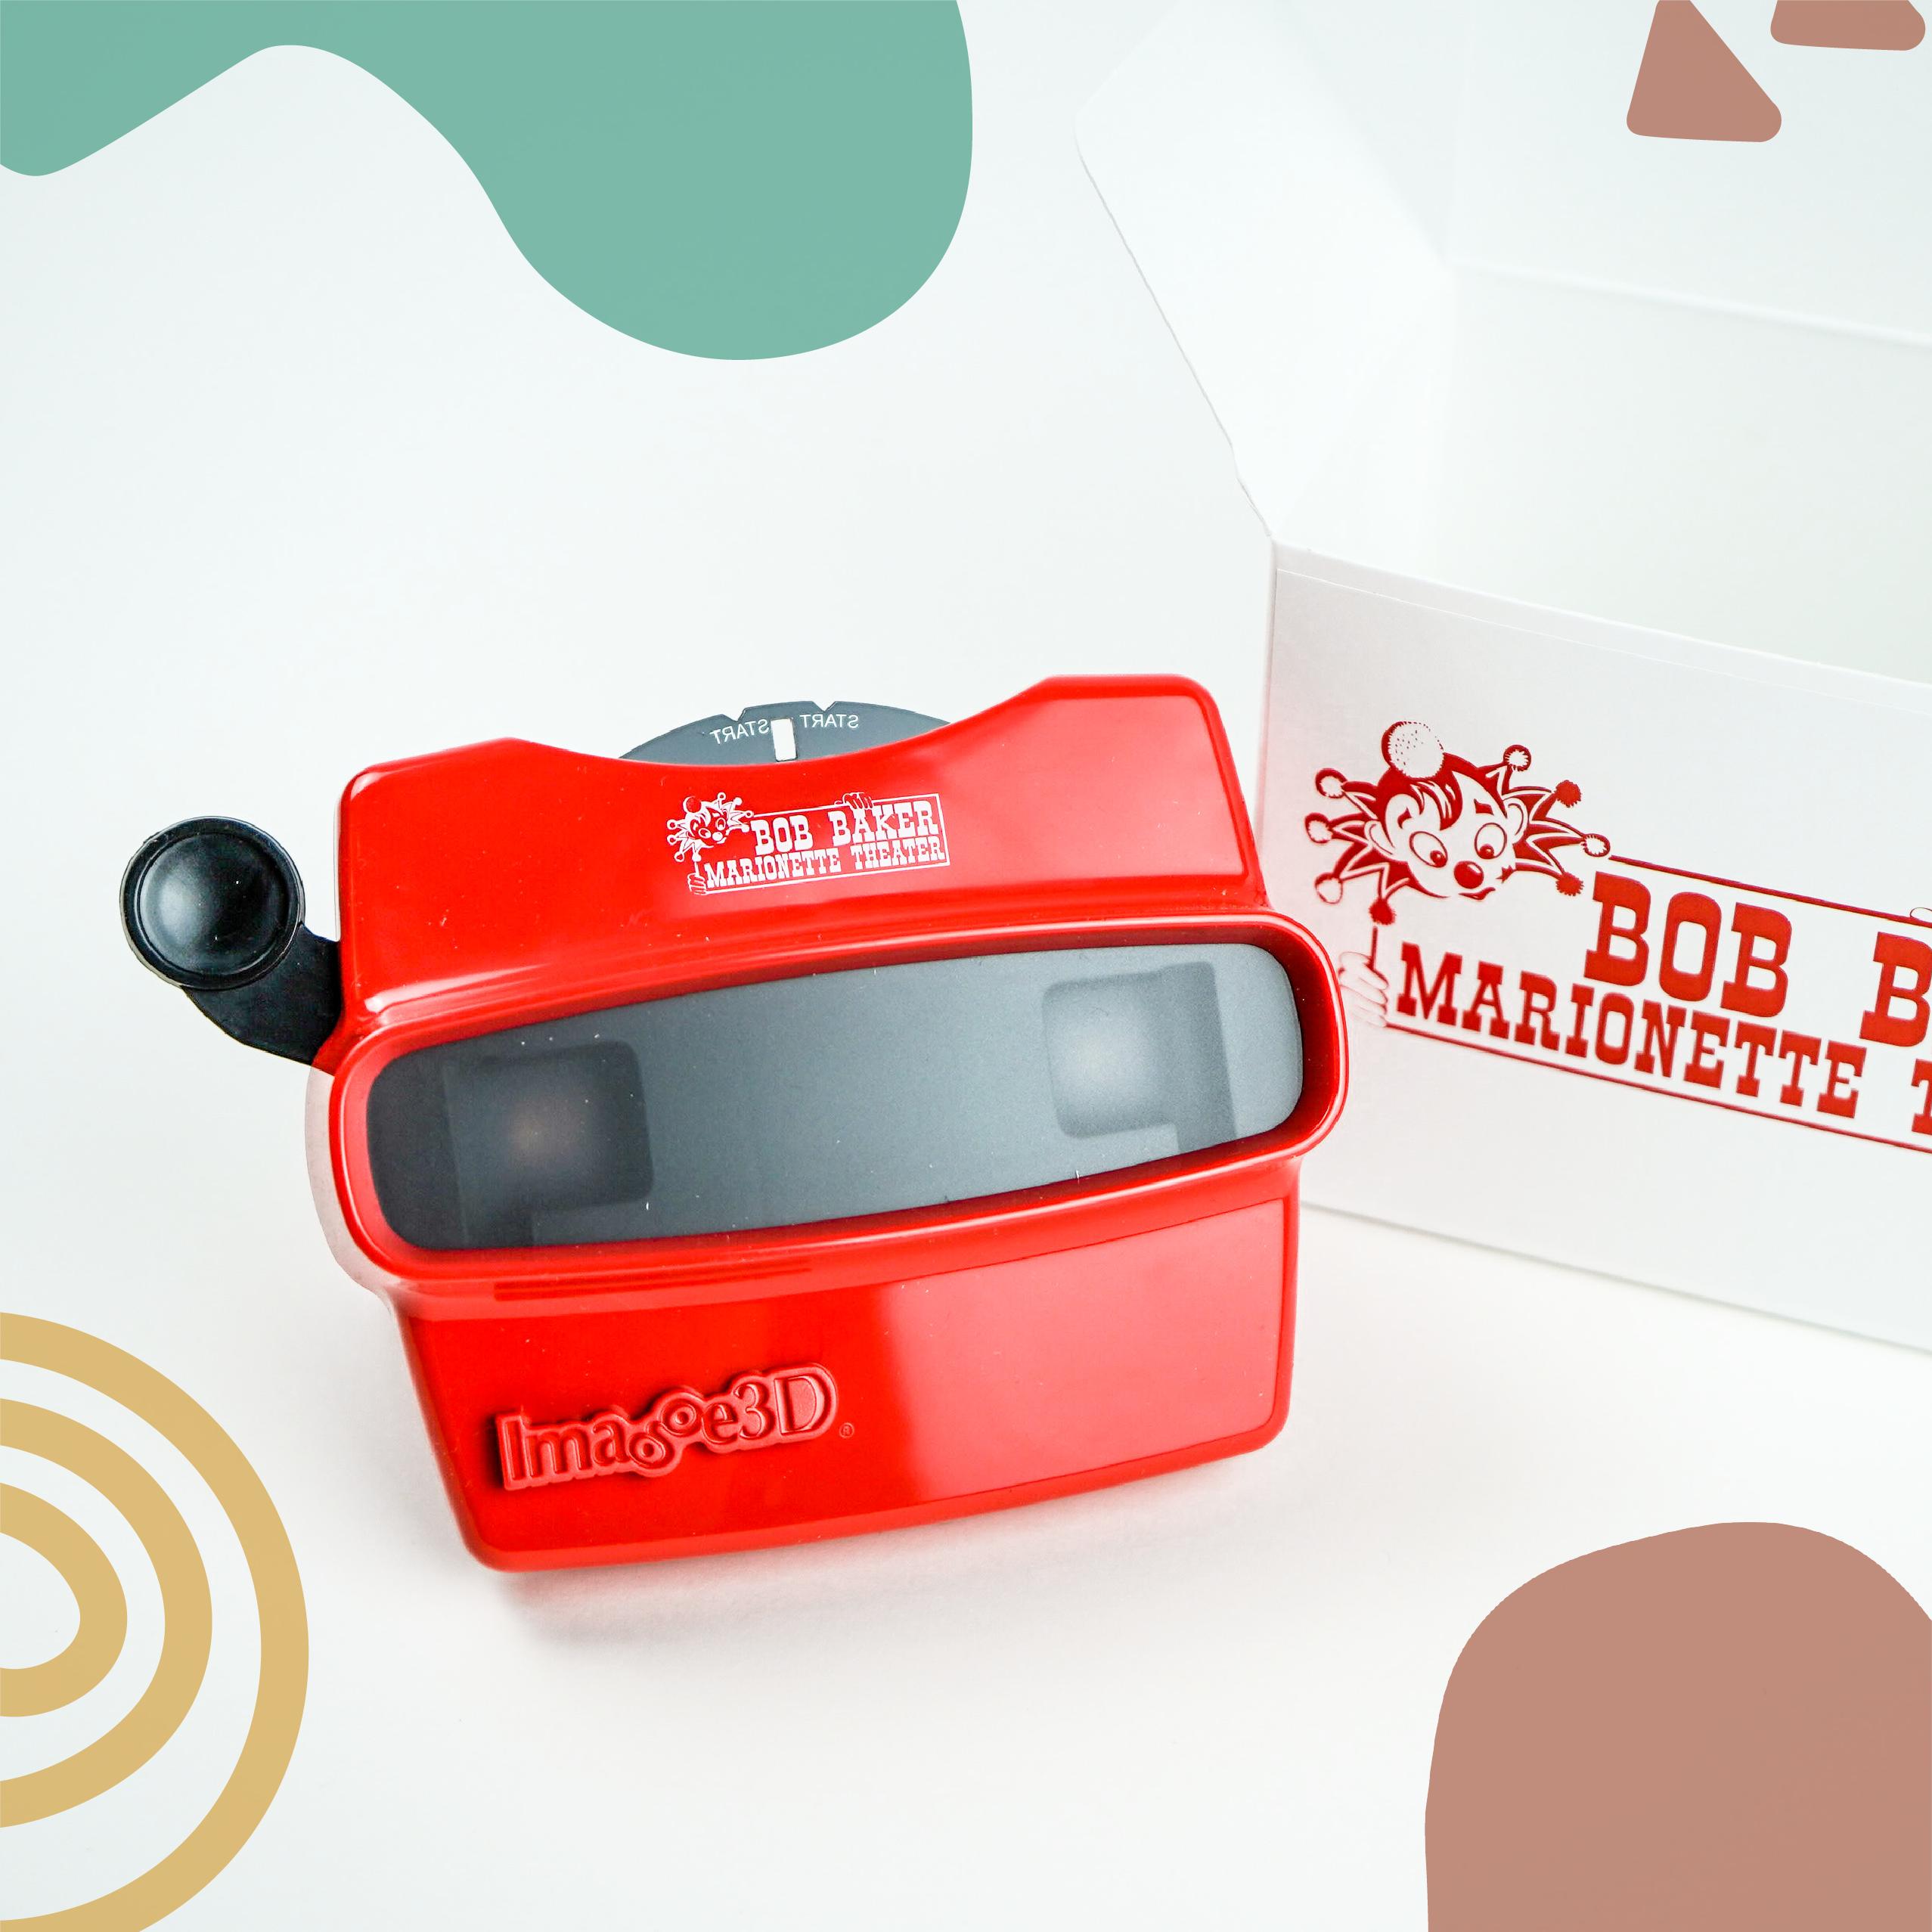 bob baker red visionmaster toy